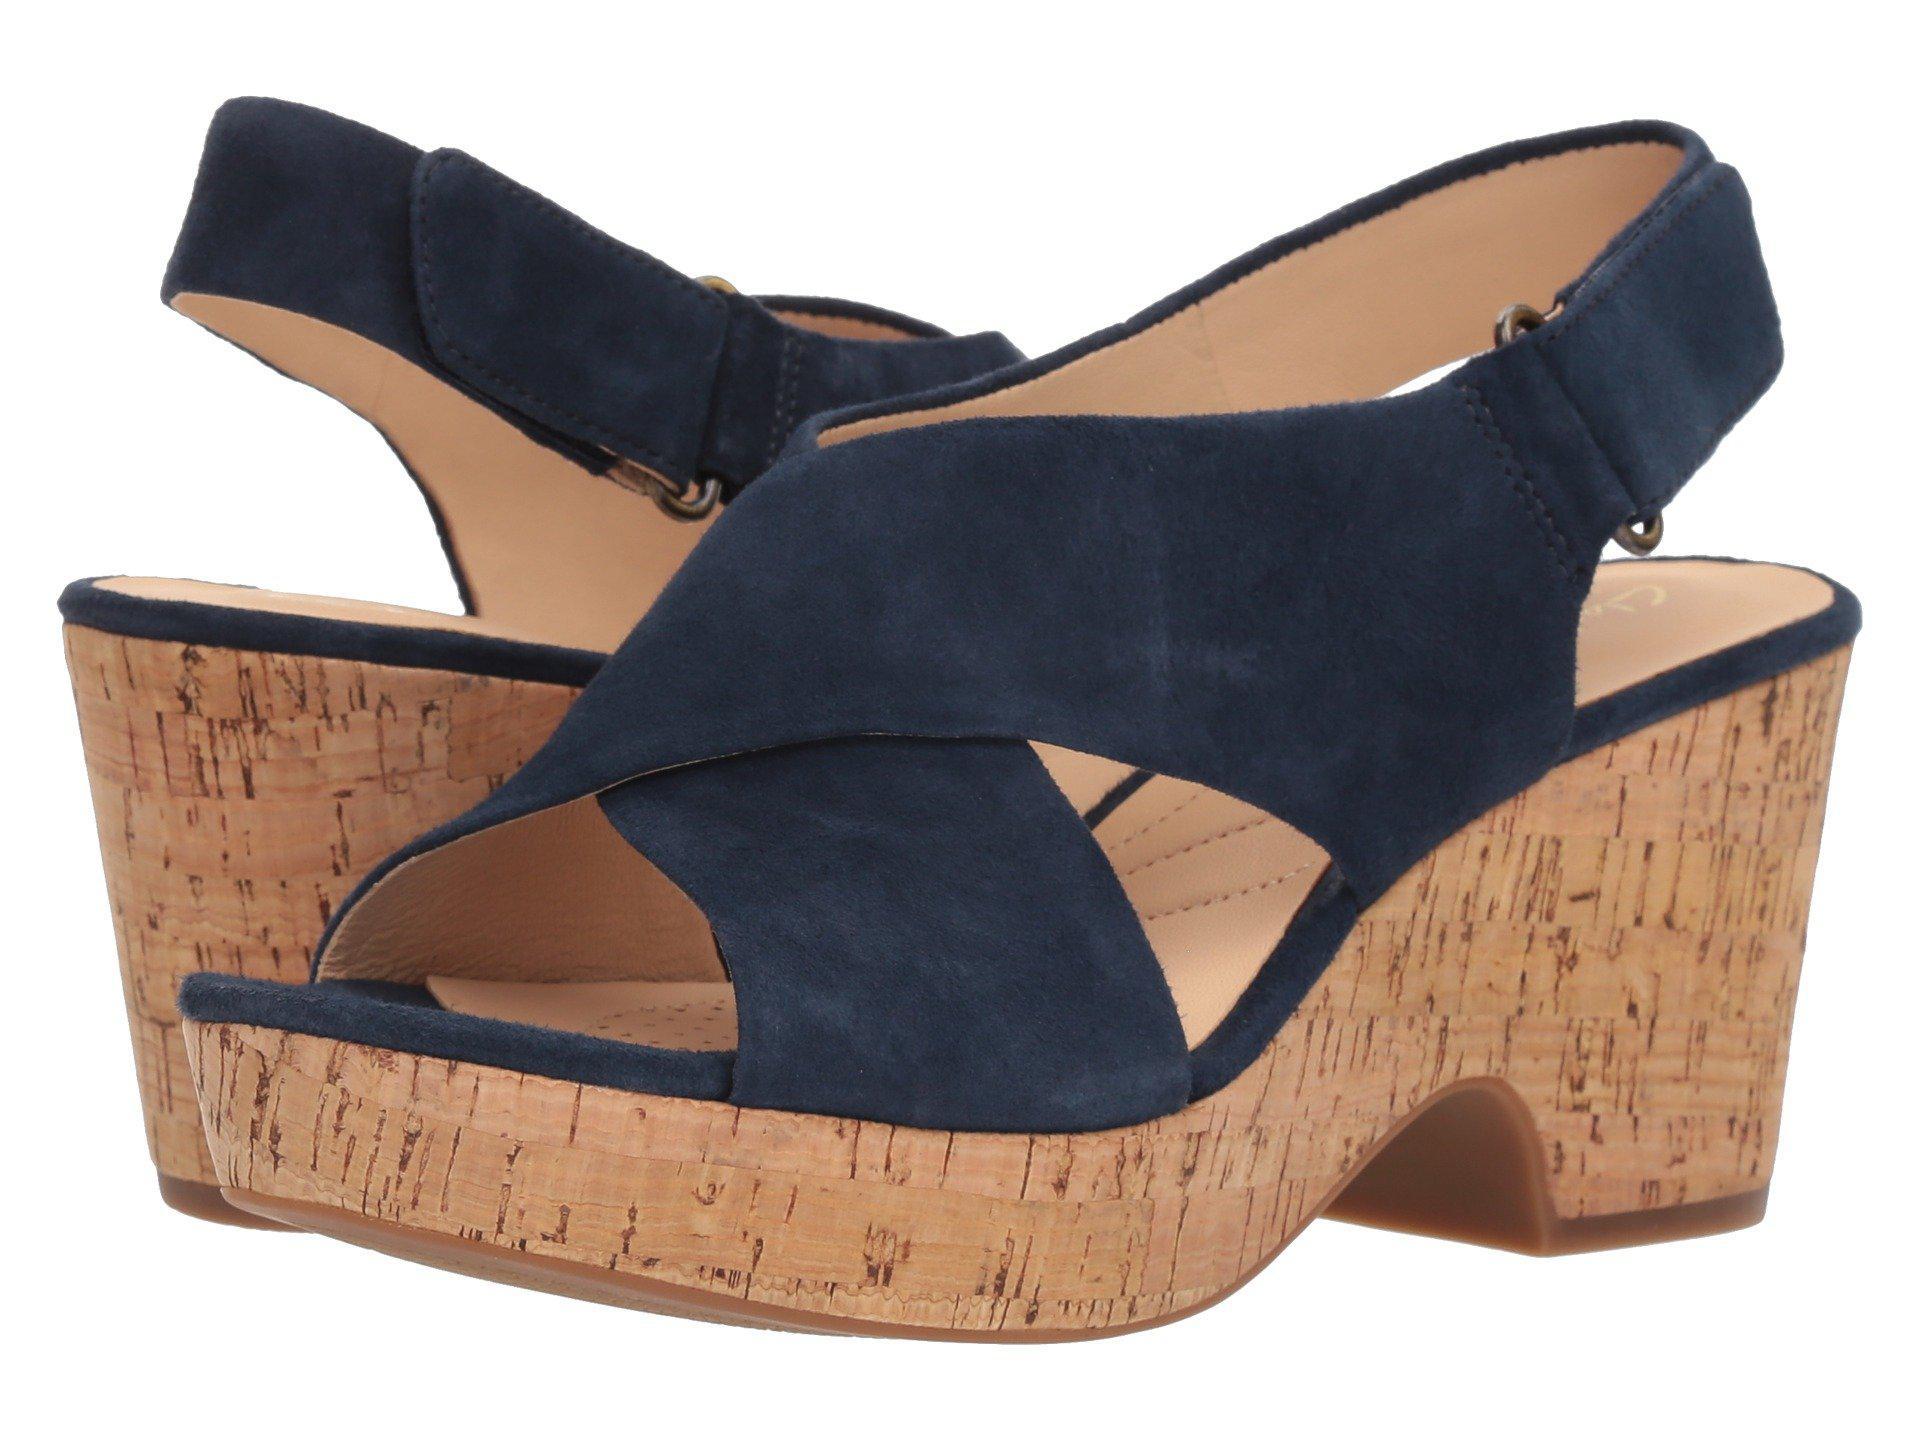 6c90e37f66 Clarks Maritsa Lara (navy Suede/cork) Women's Wedge Shoes in Blue - Lyst